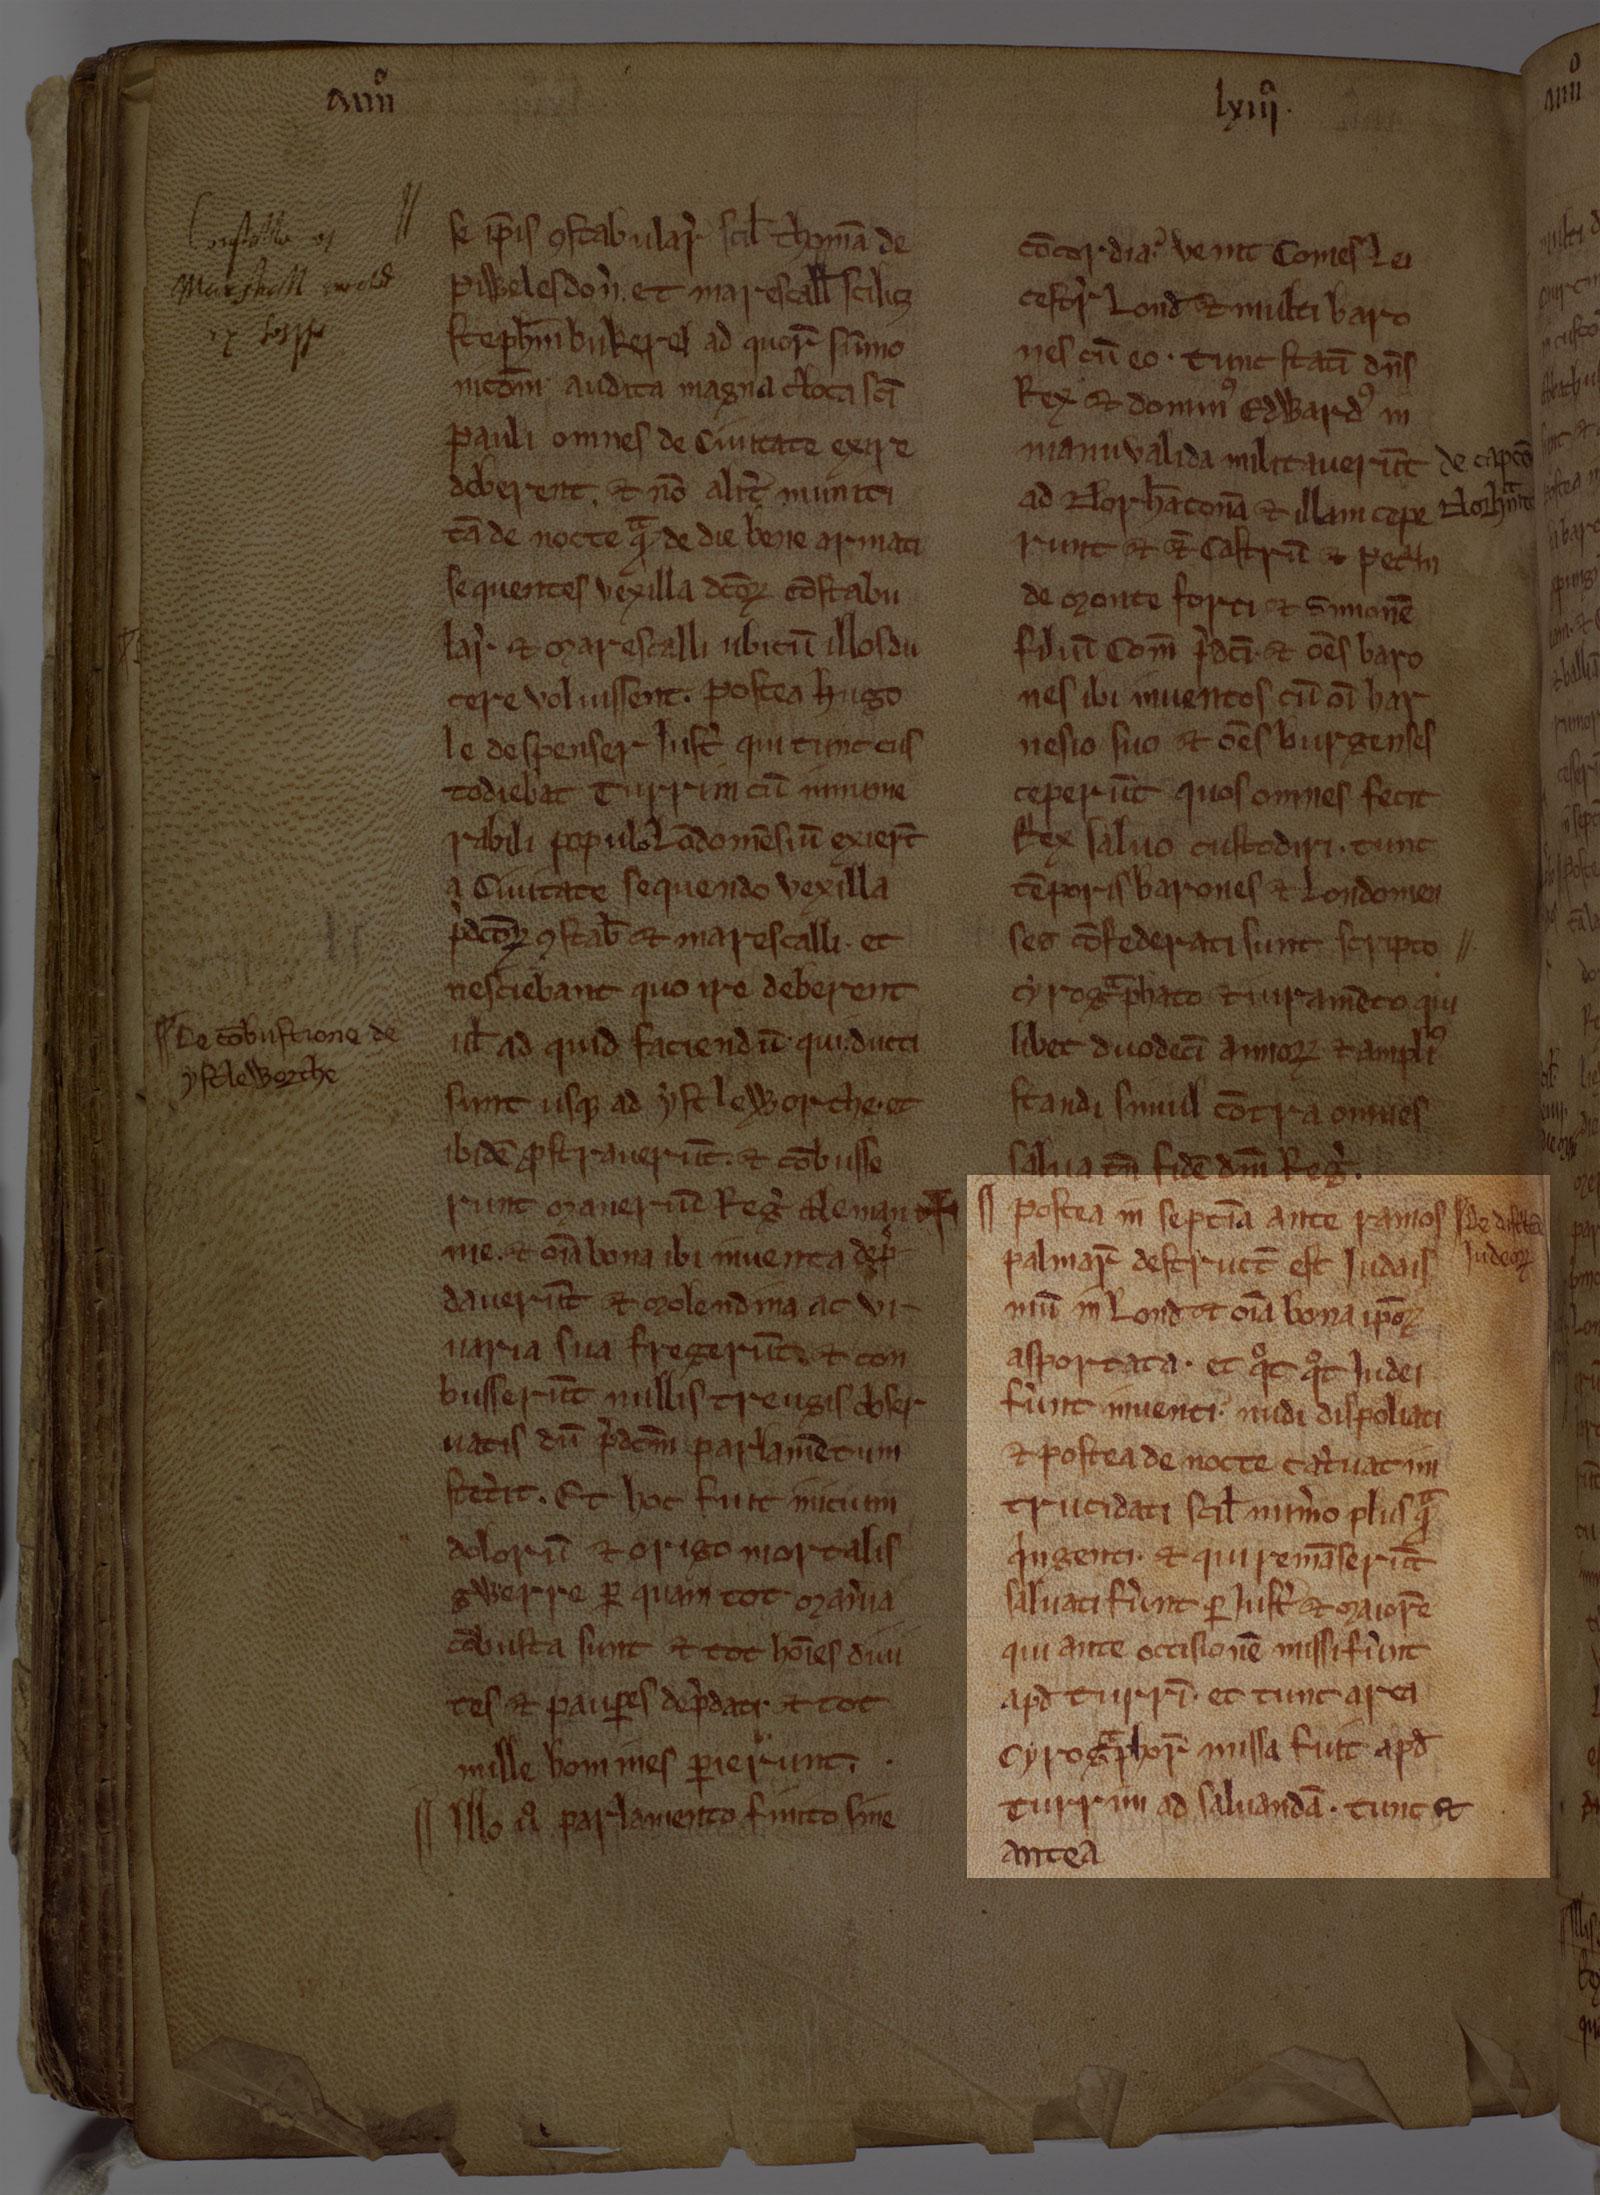 Massacre of the Jews, 1265 (London Metropolitan Archive)